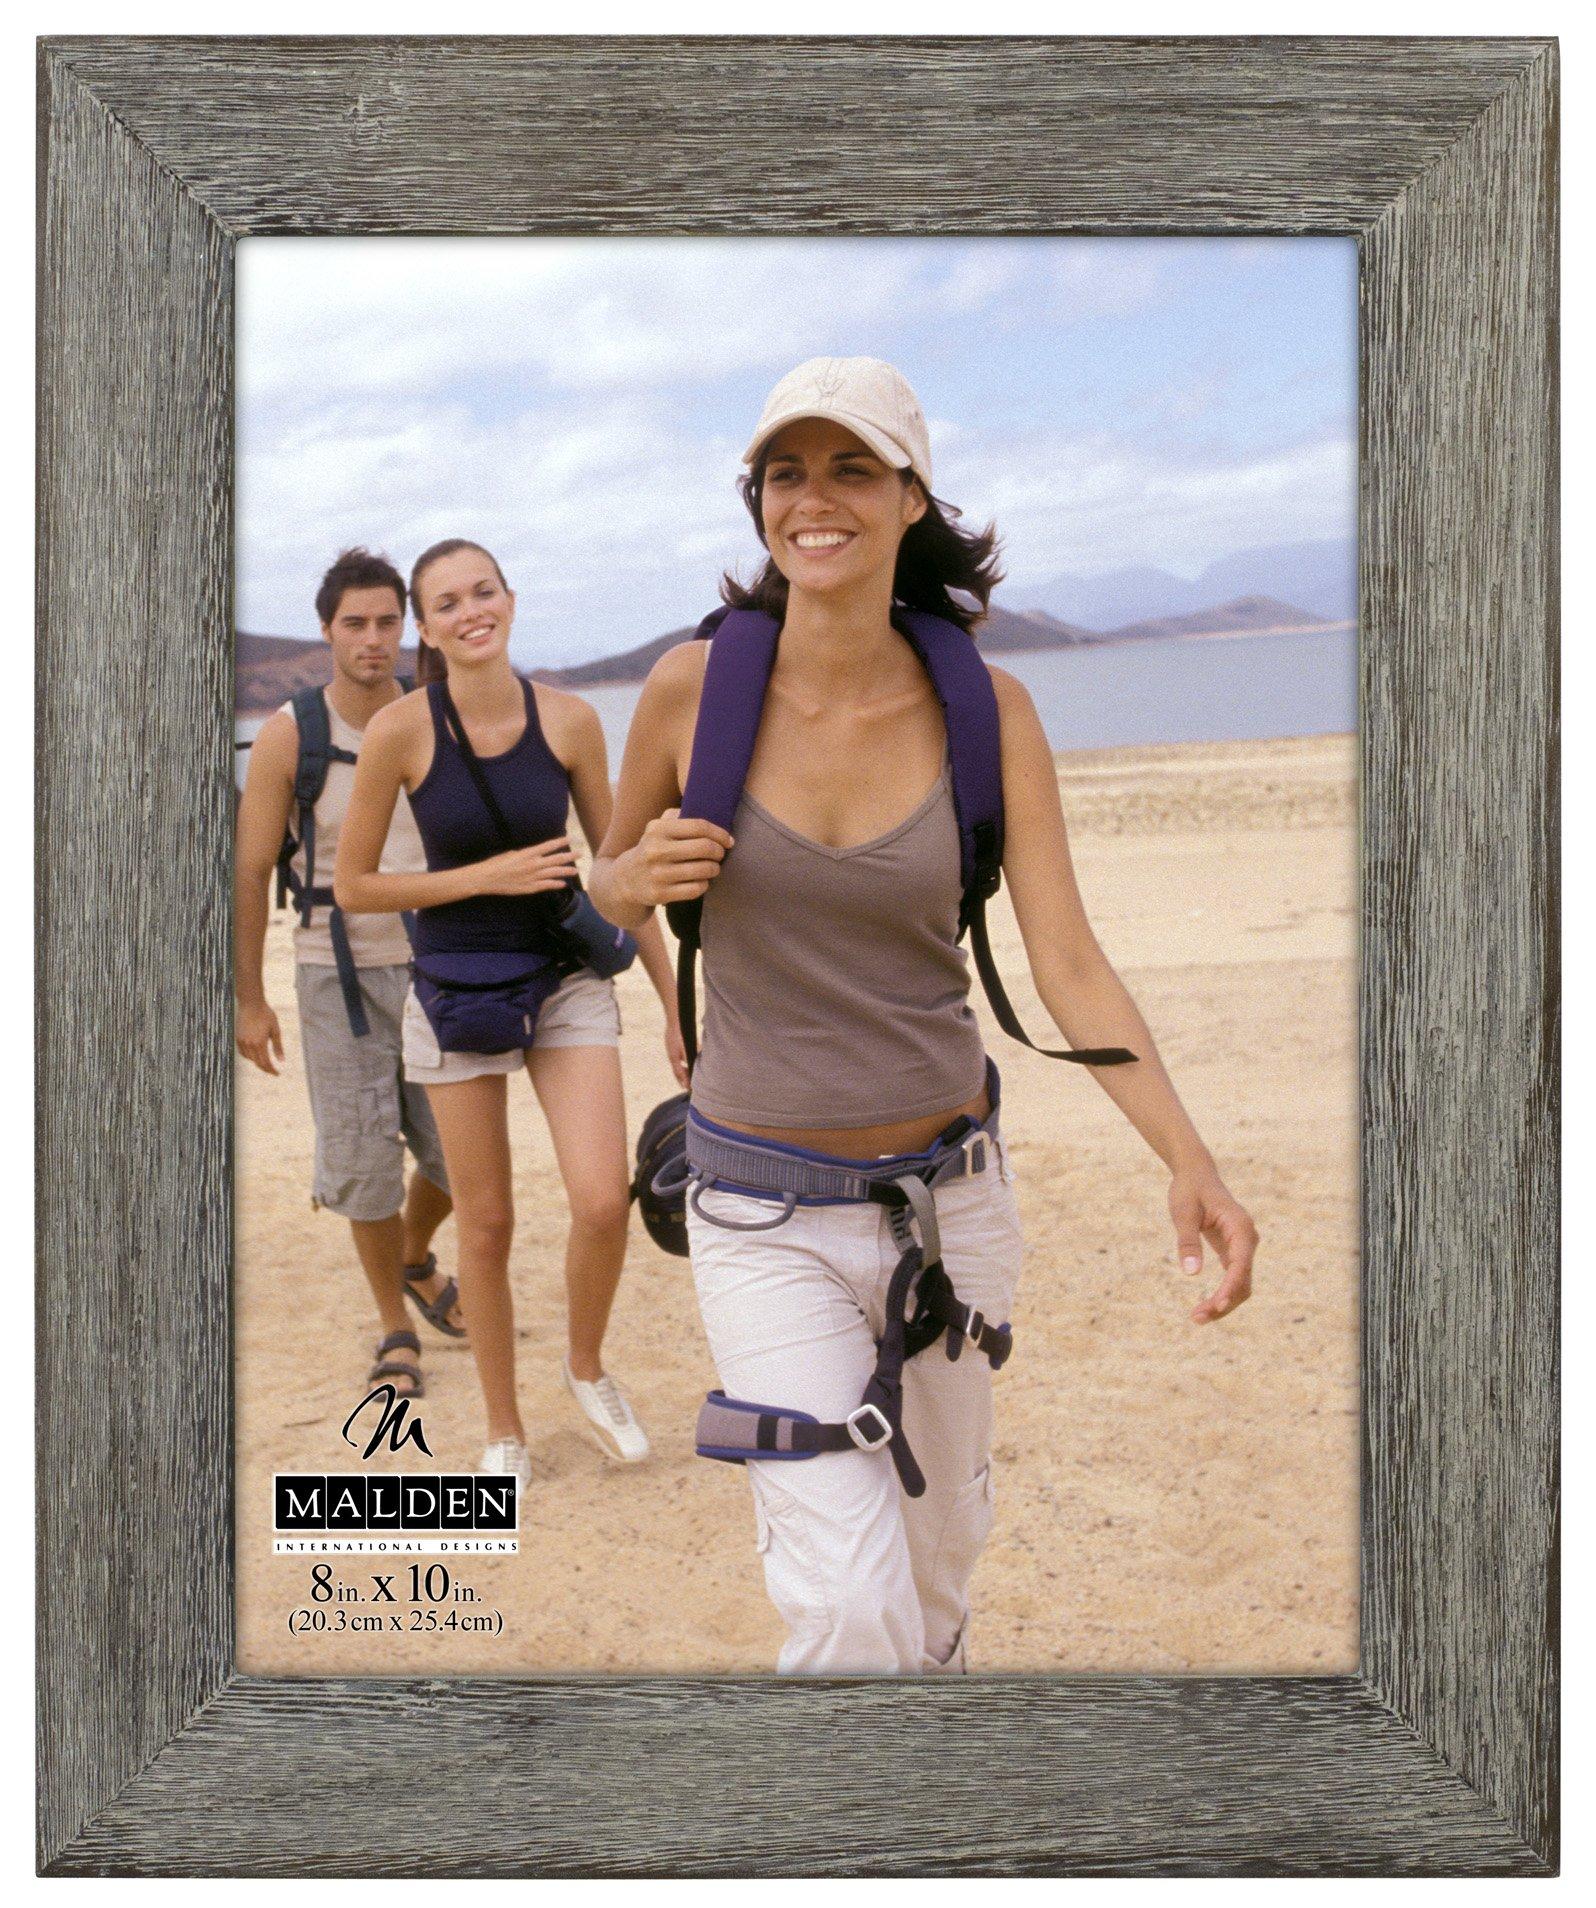 Malden International Designs Rustic Fashion Wide Linear Graywash Wooden Picture Frame, 8x10, Gray by Malden International Designs